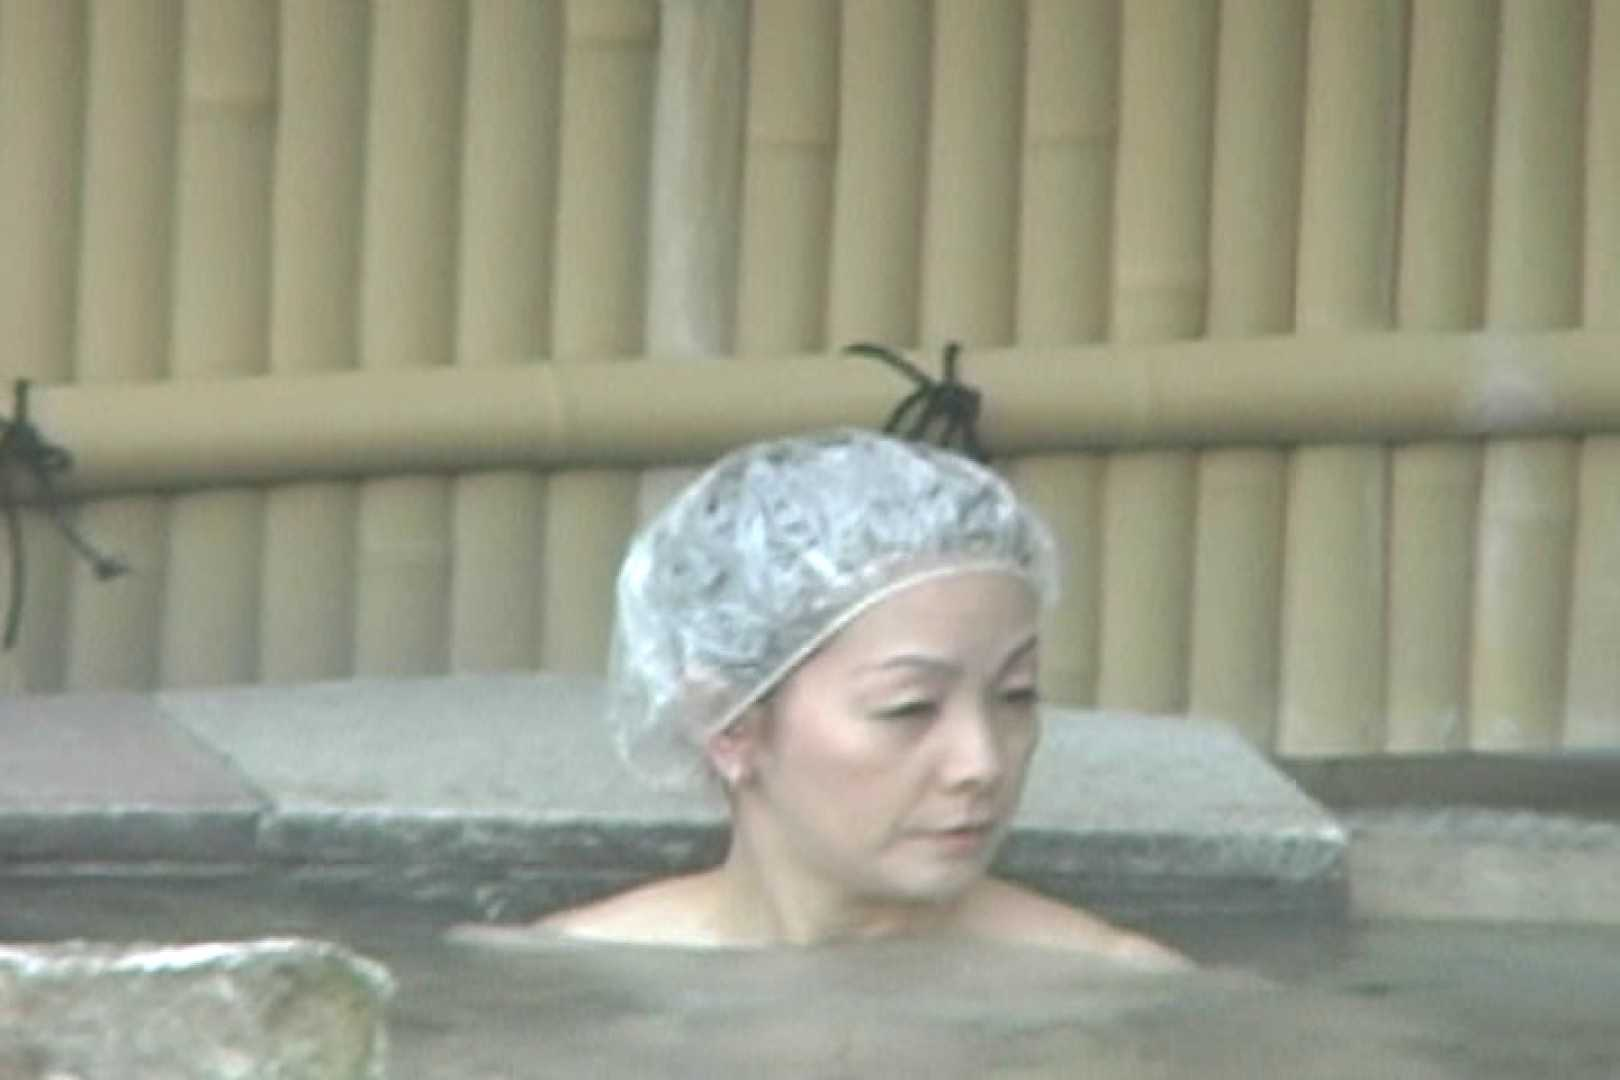 Aquaな露天風呂Vol.592 露天風呂突入 盗撮動画紹介 91pic 5